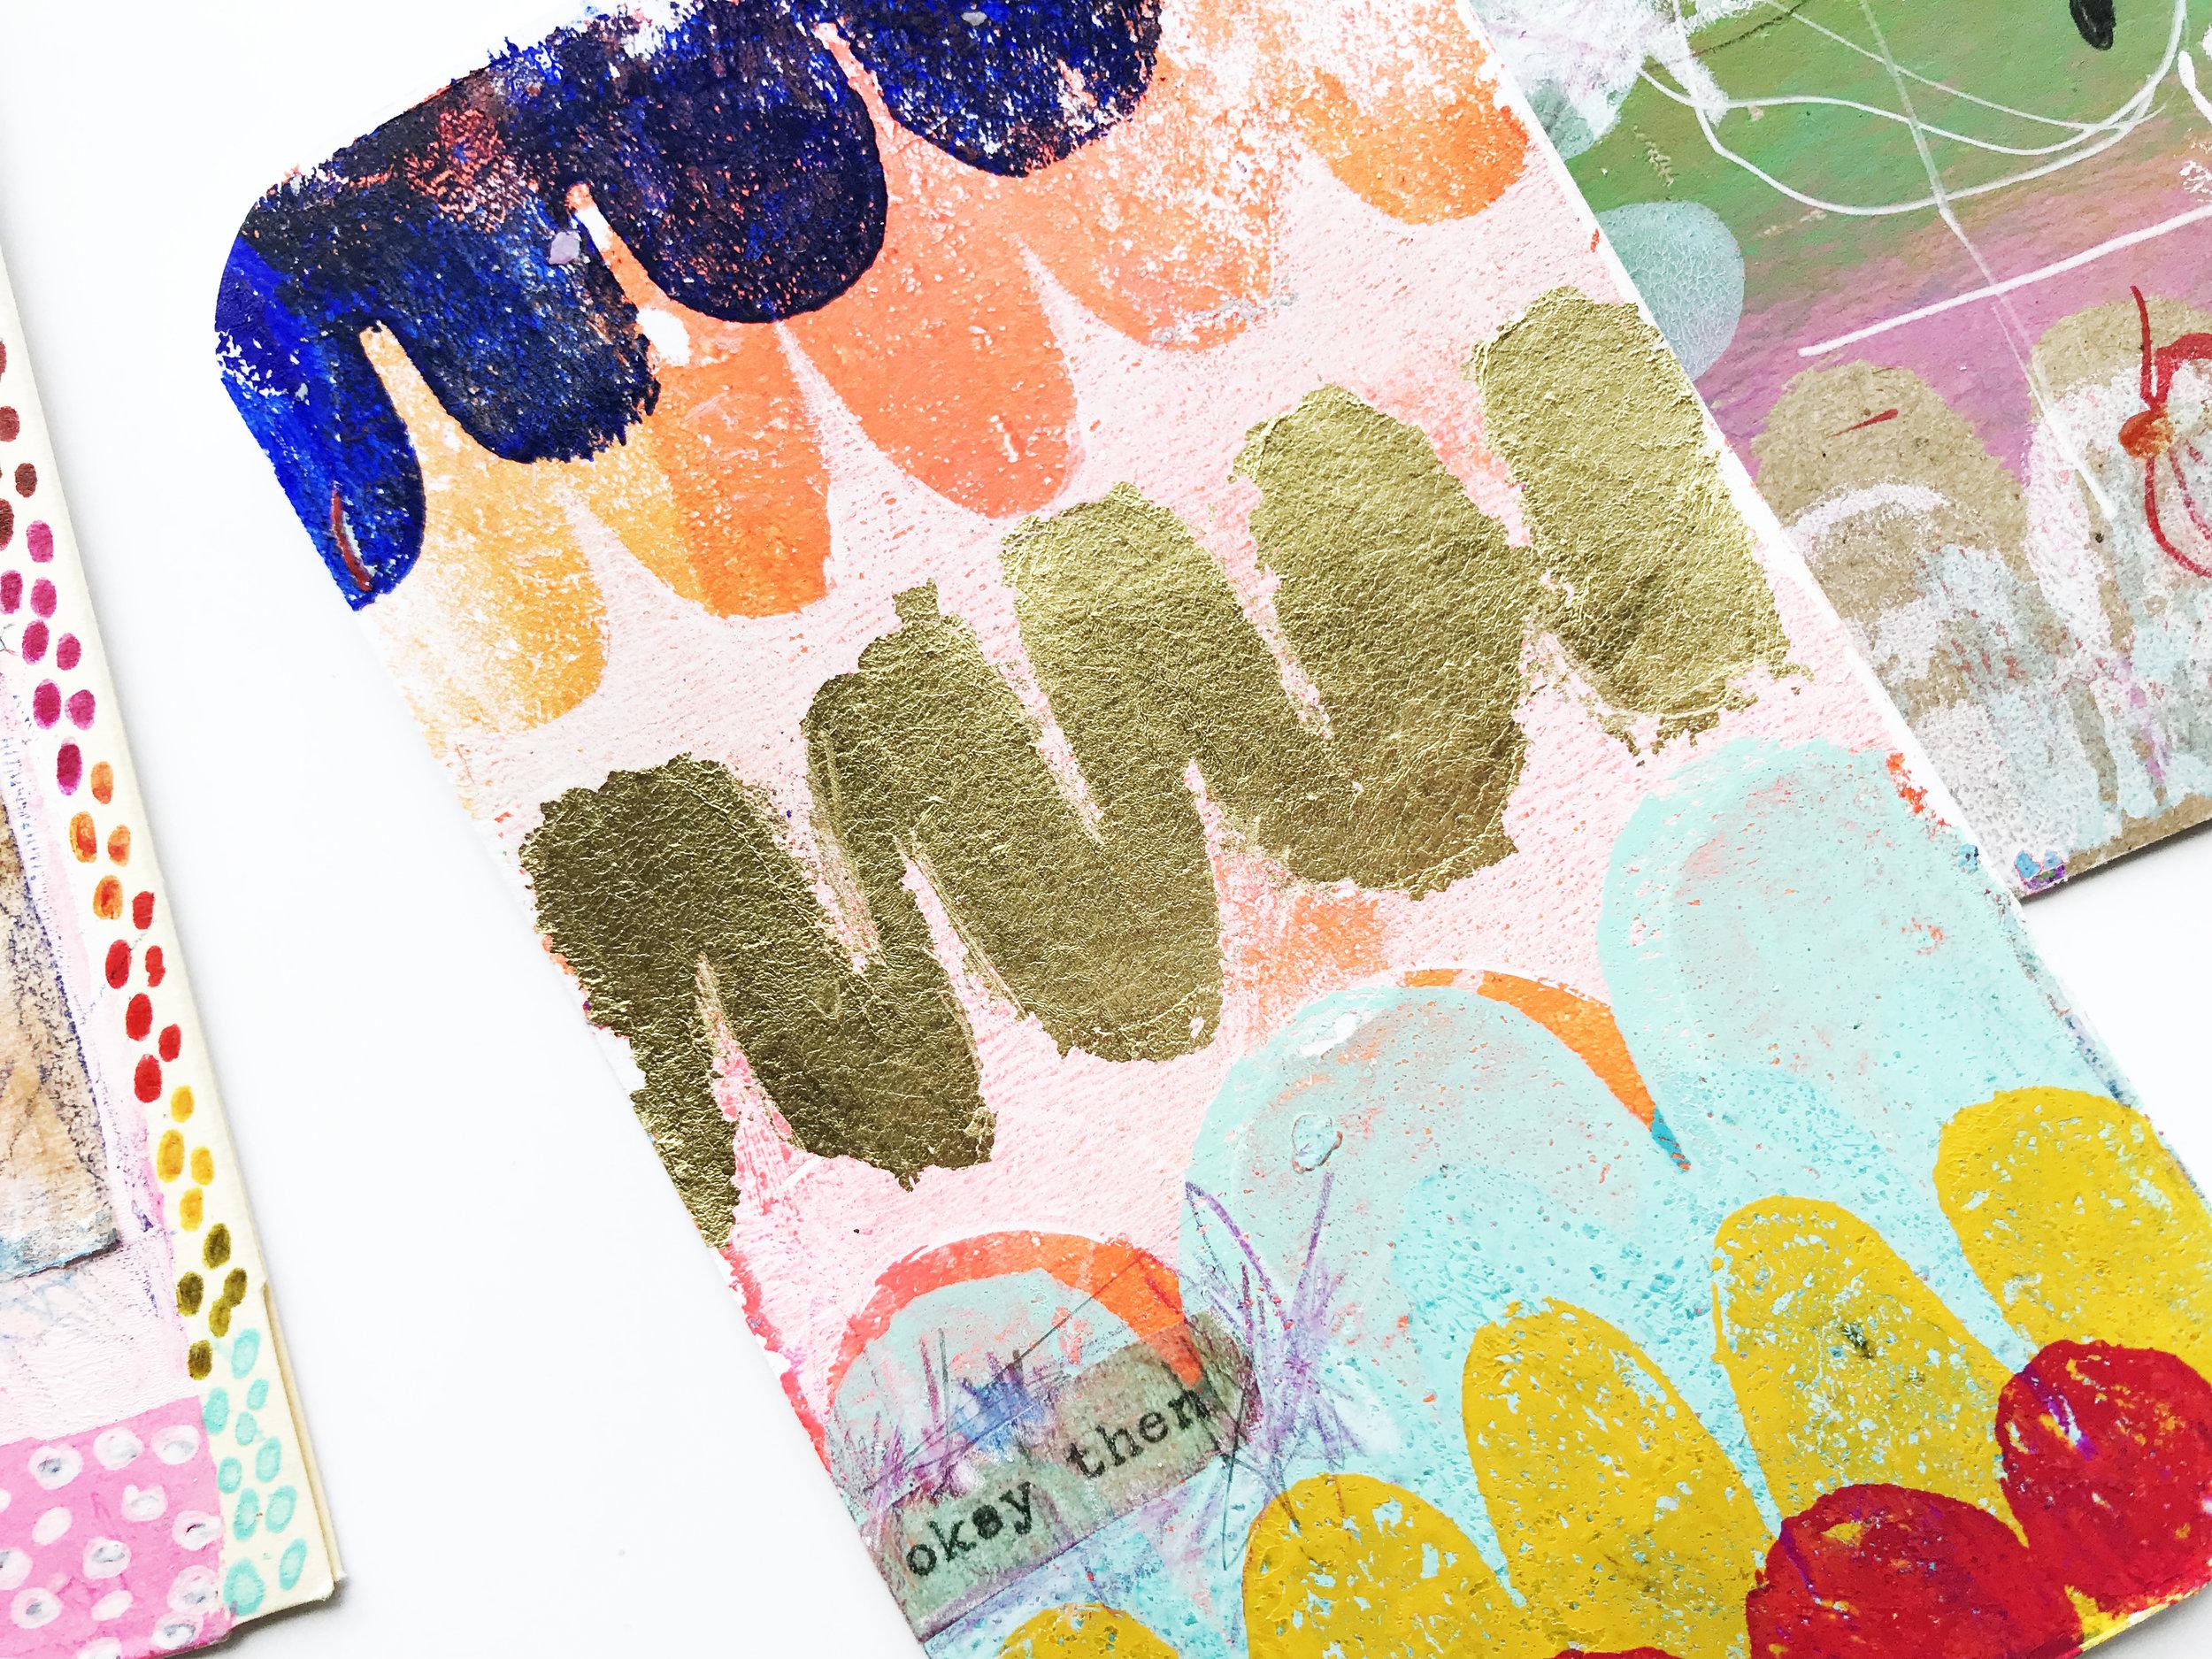 Rae Missigman_Mono Print Mask L739_art notes 2.jpg